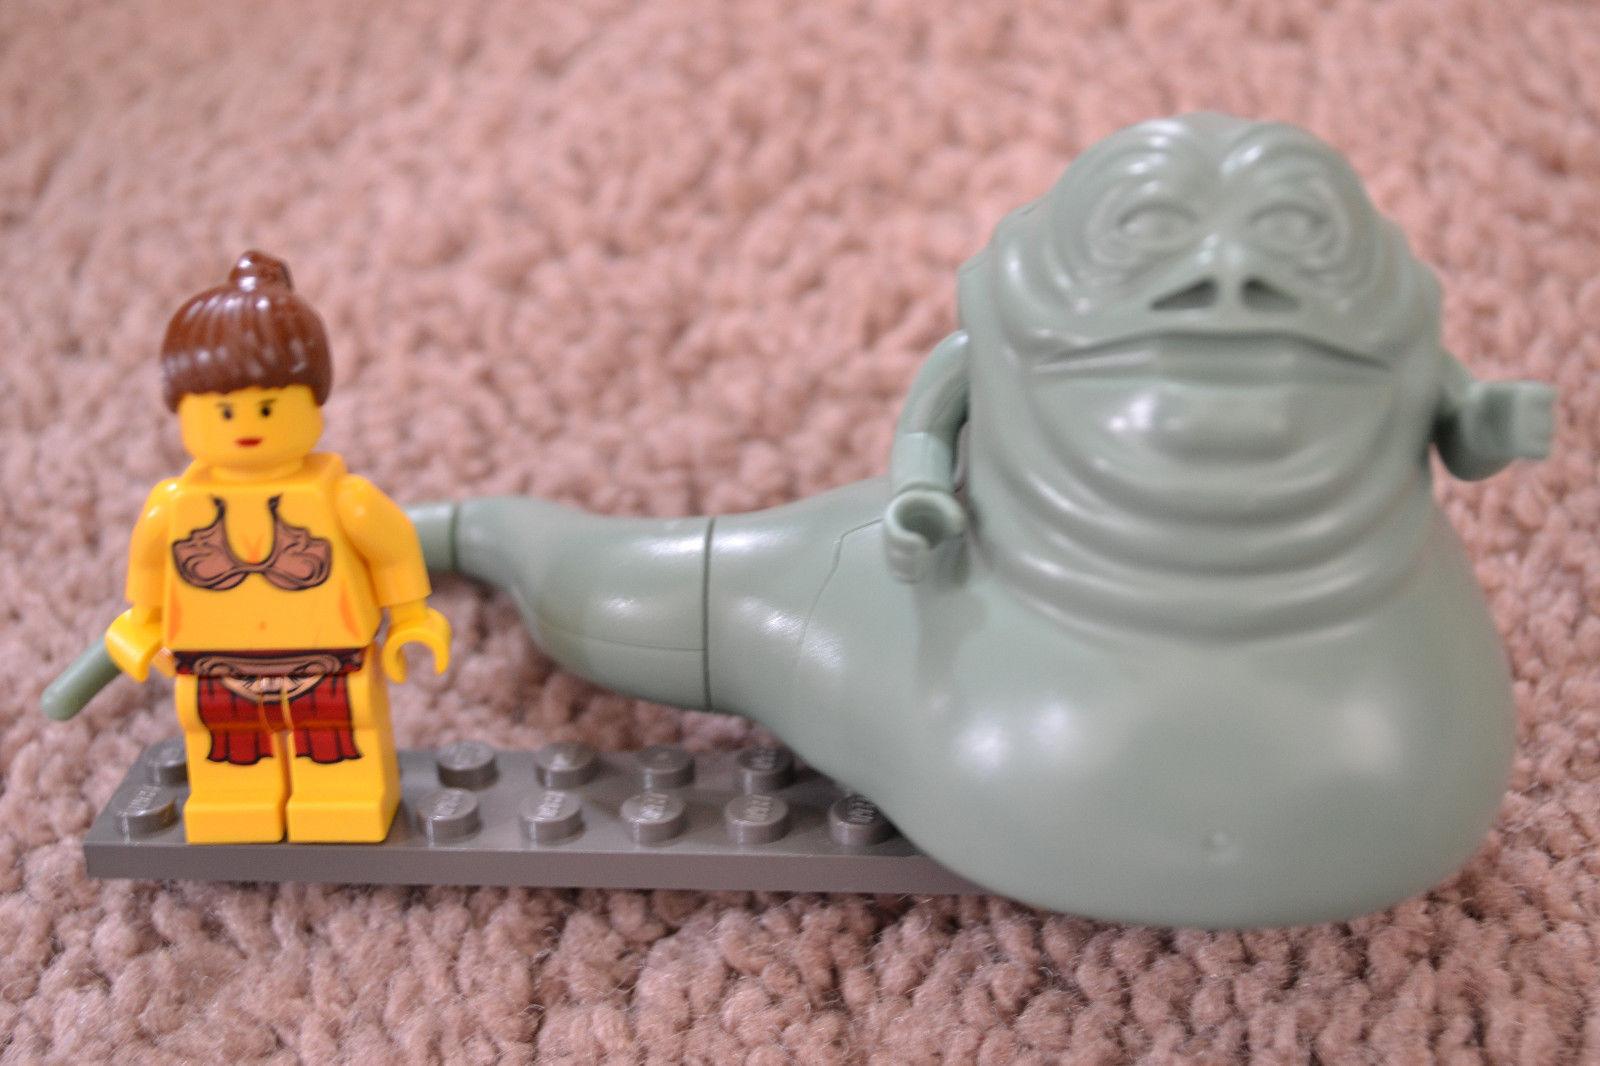 LEGO STAR WARS JABBA THE HUTT, SLAVE PRINCESS LEIA Lego MINI FIGS